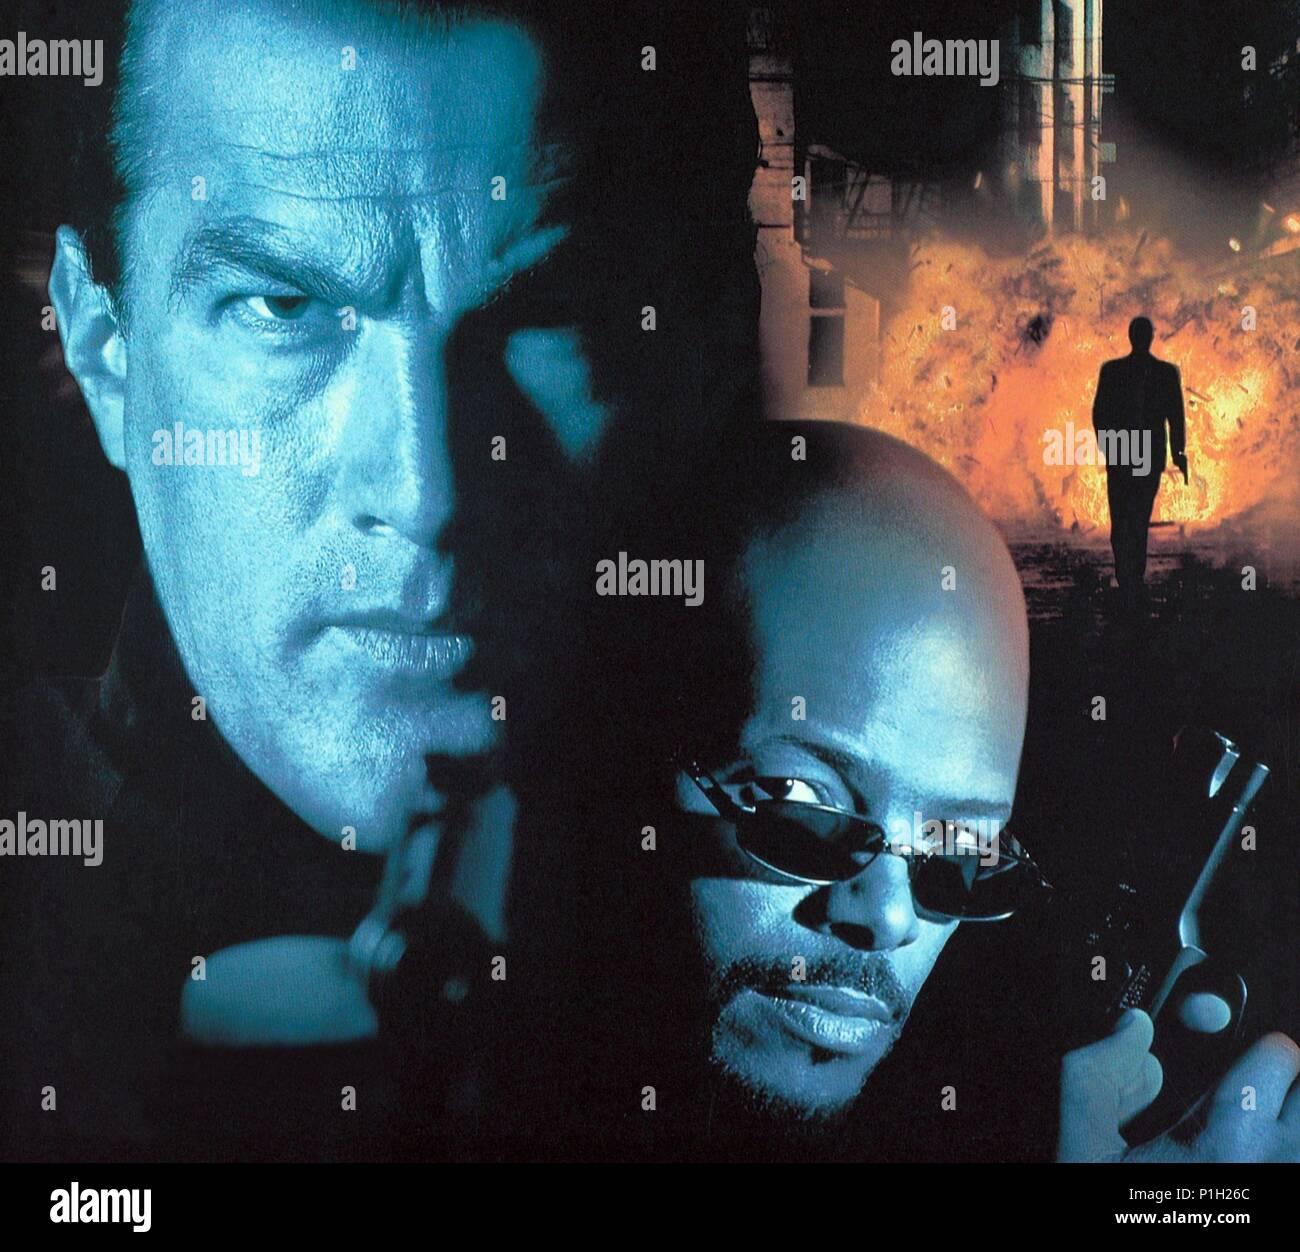 Original Film Title Glimmer Man English Title Glimmer Man